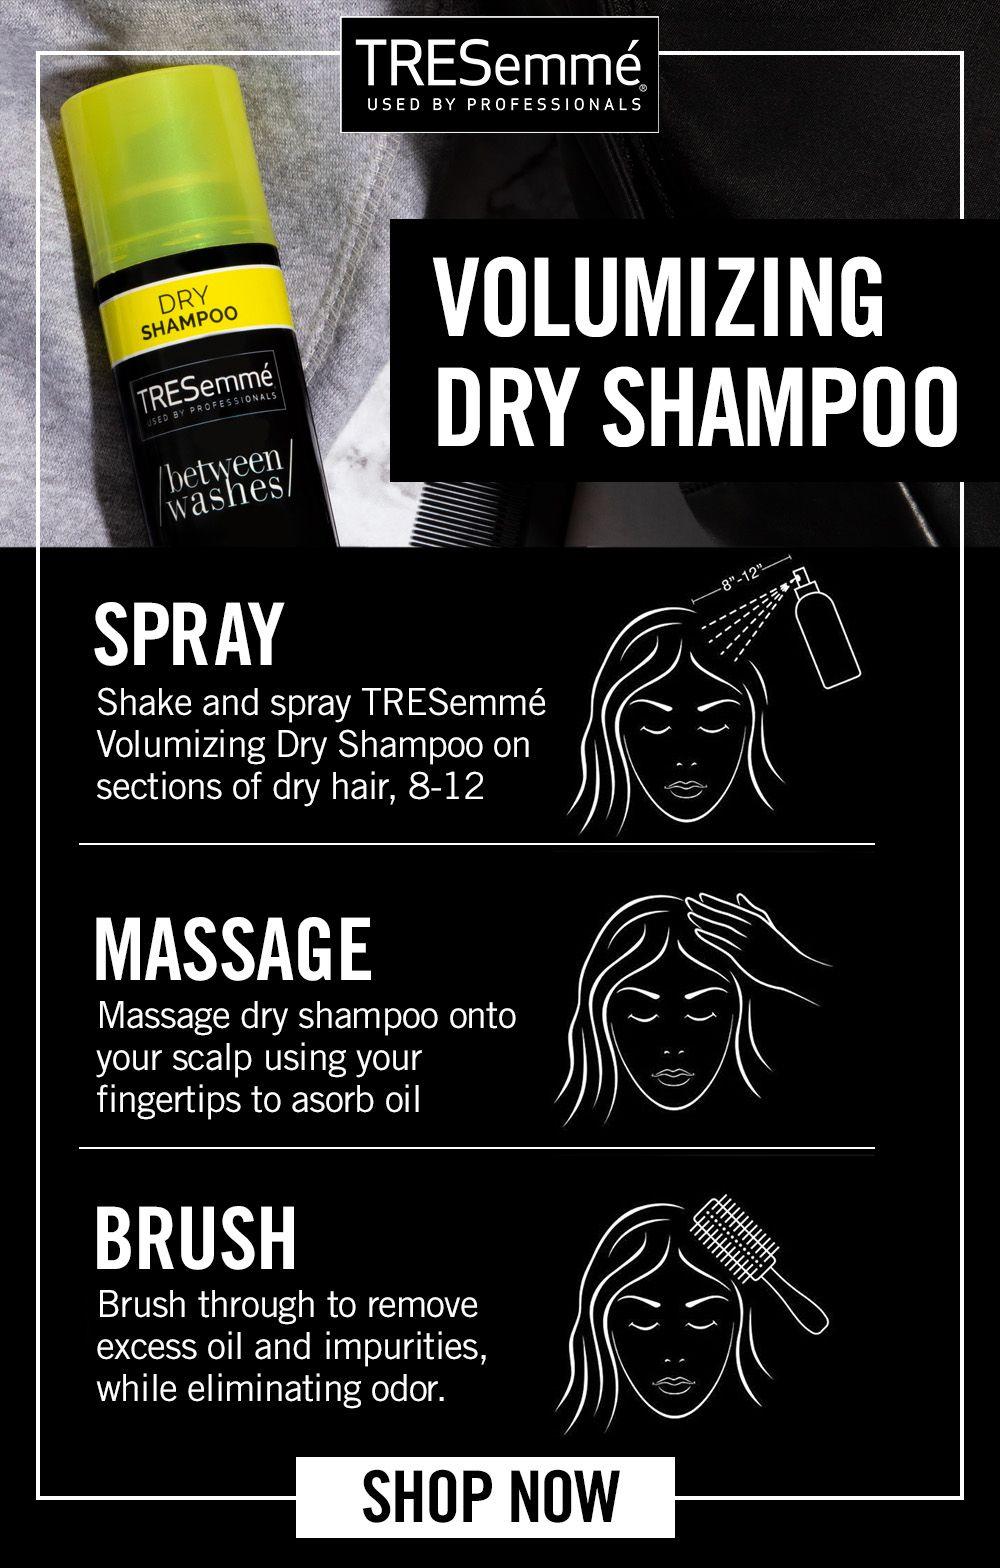 Volumizing Dry Shampoo Tresemme Dry Shampoo Dry Shampoo Hairstyles Hair Help